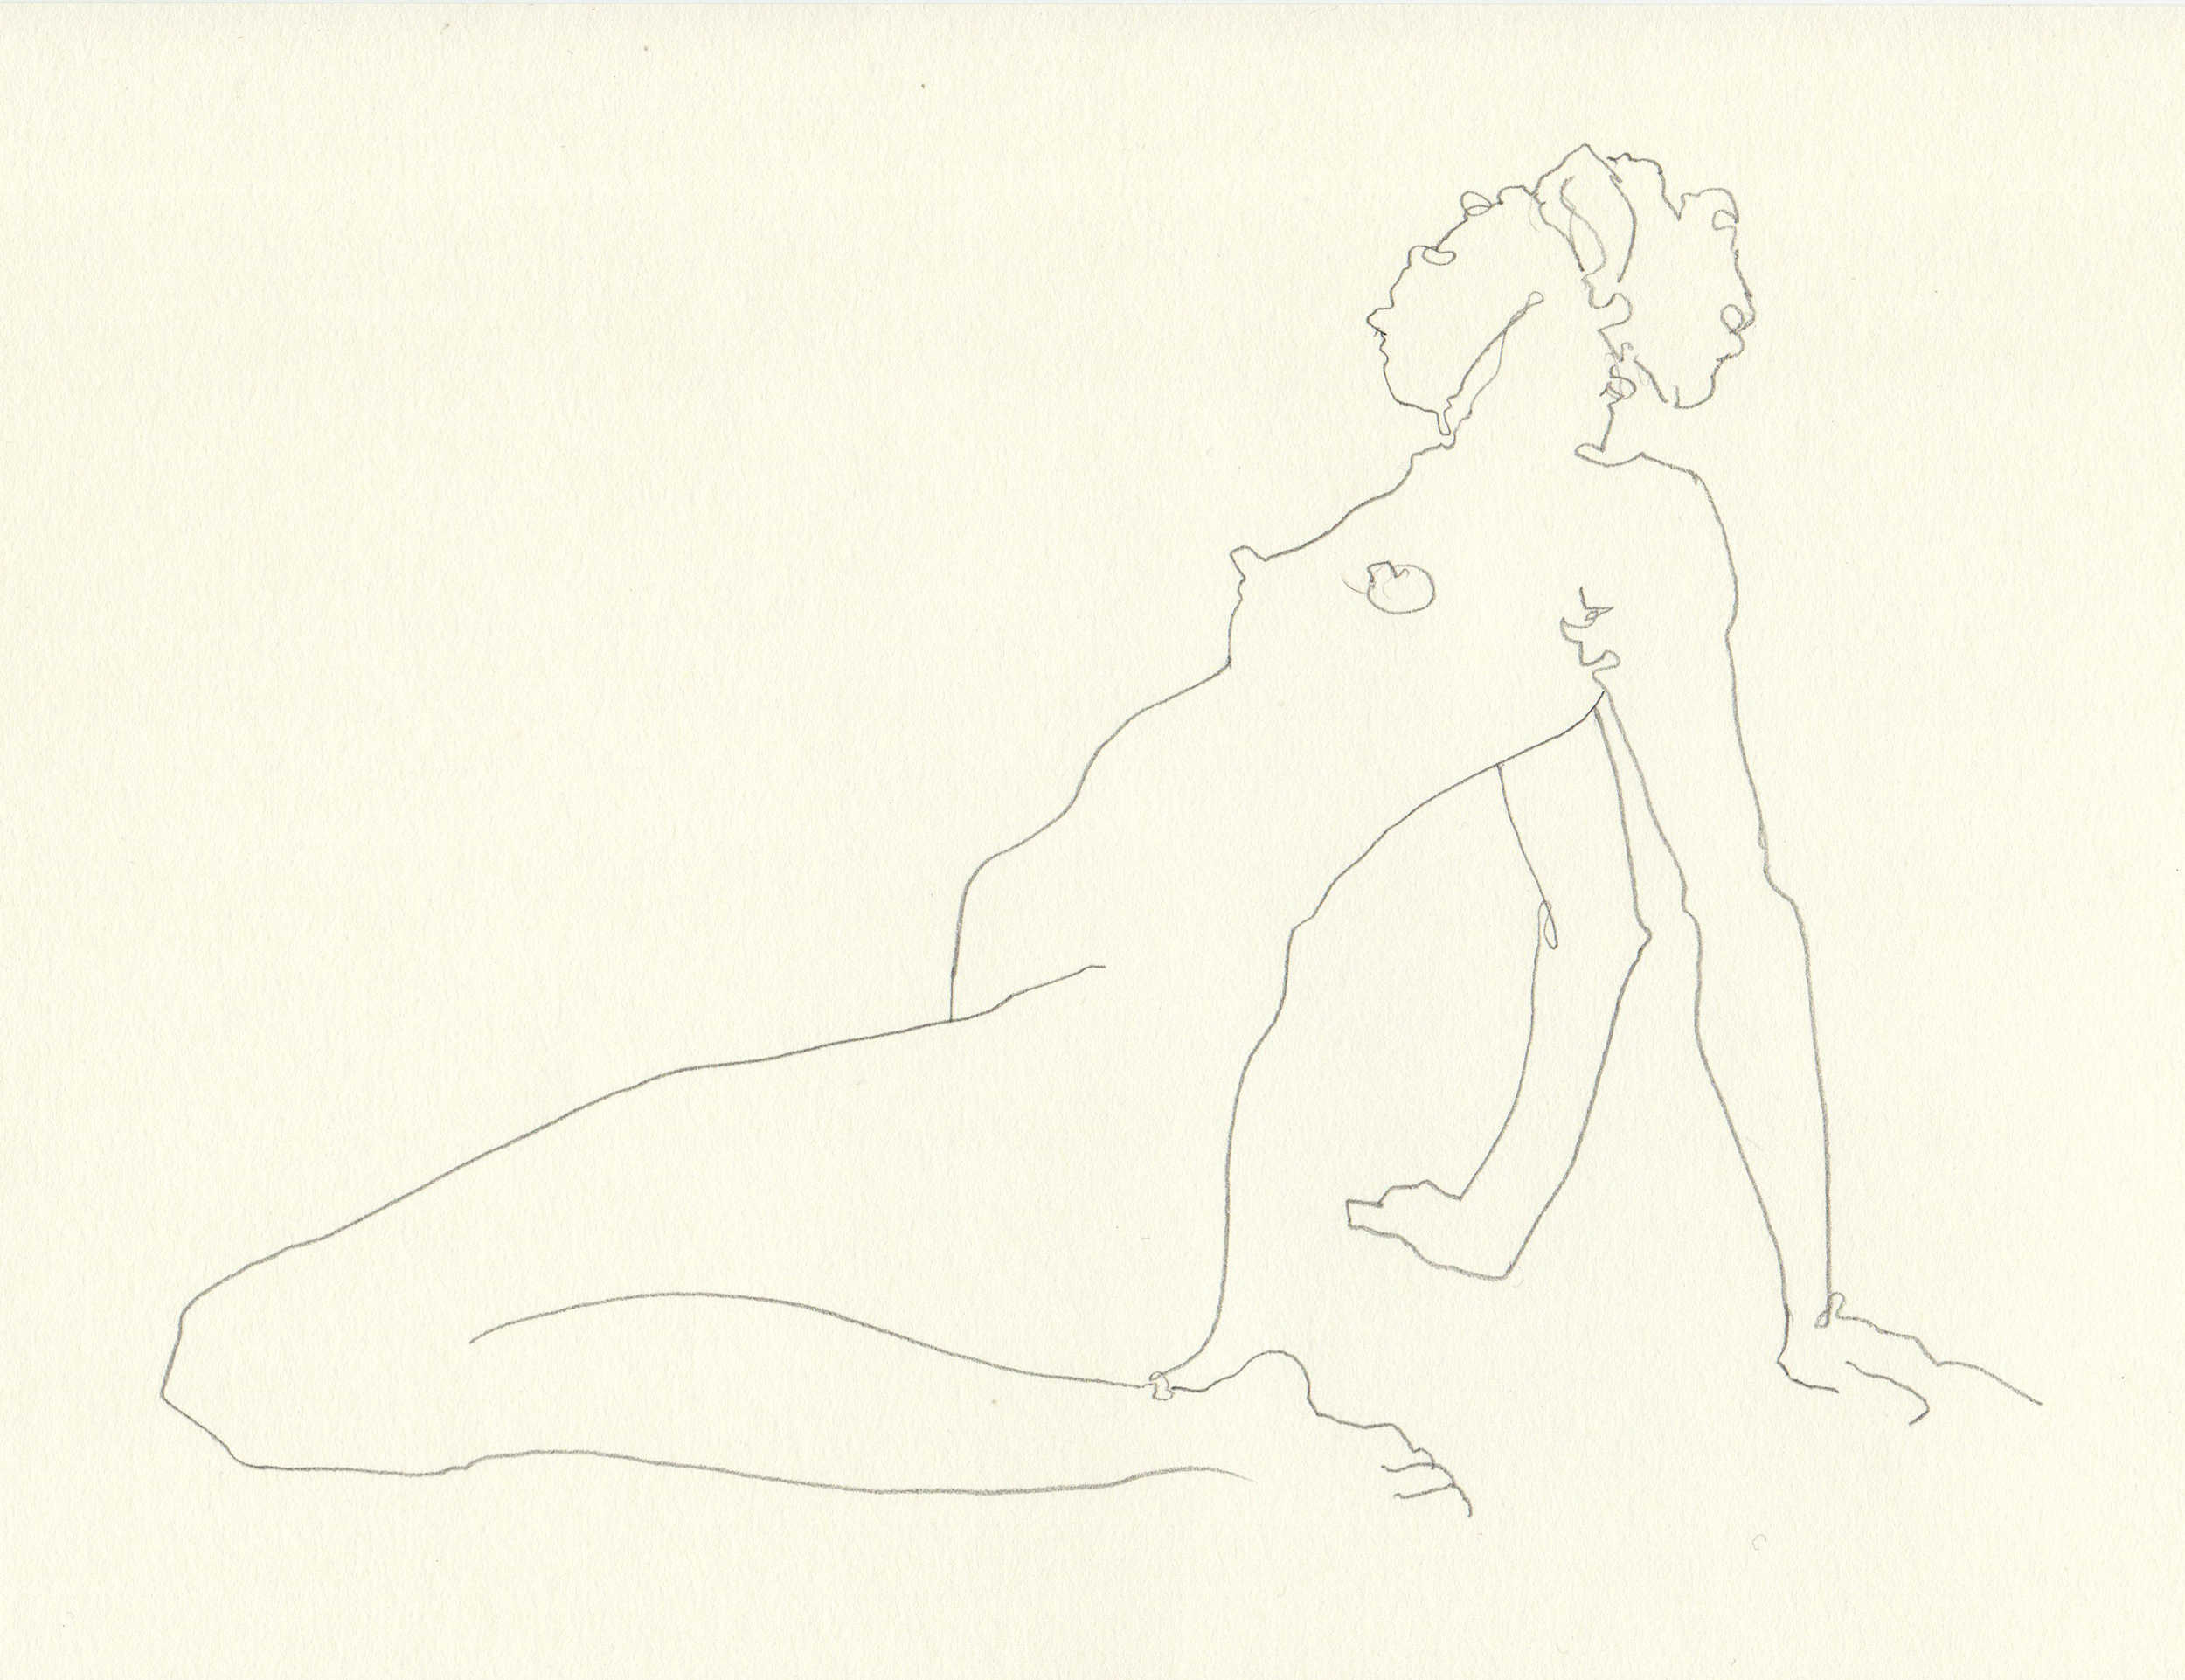 2012_Sketch_F-Beudin_076